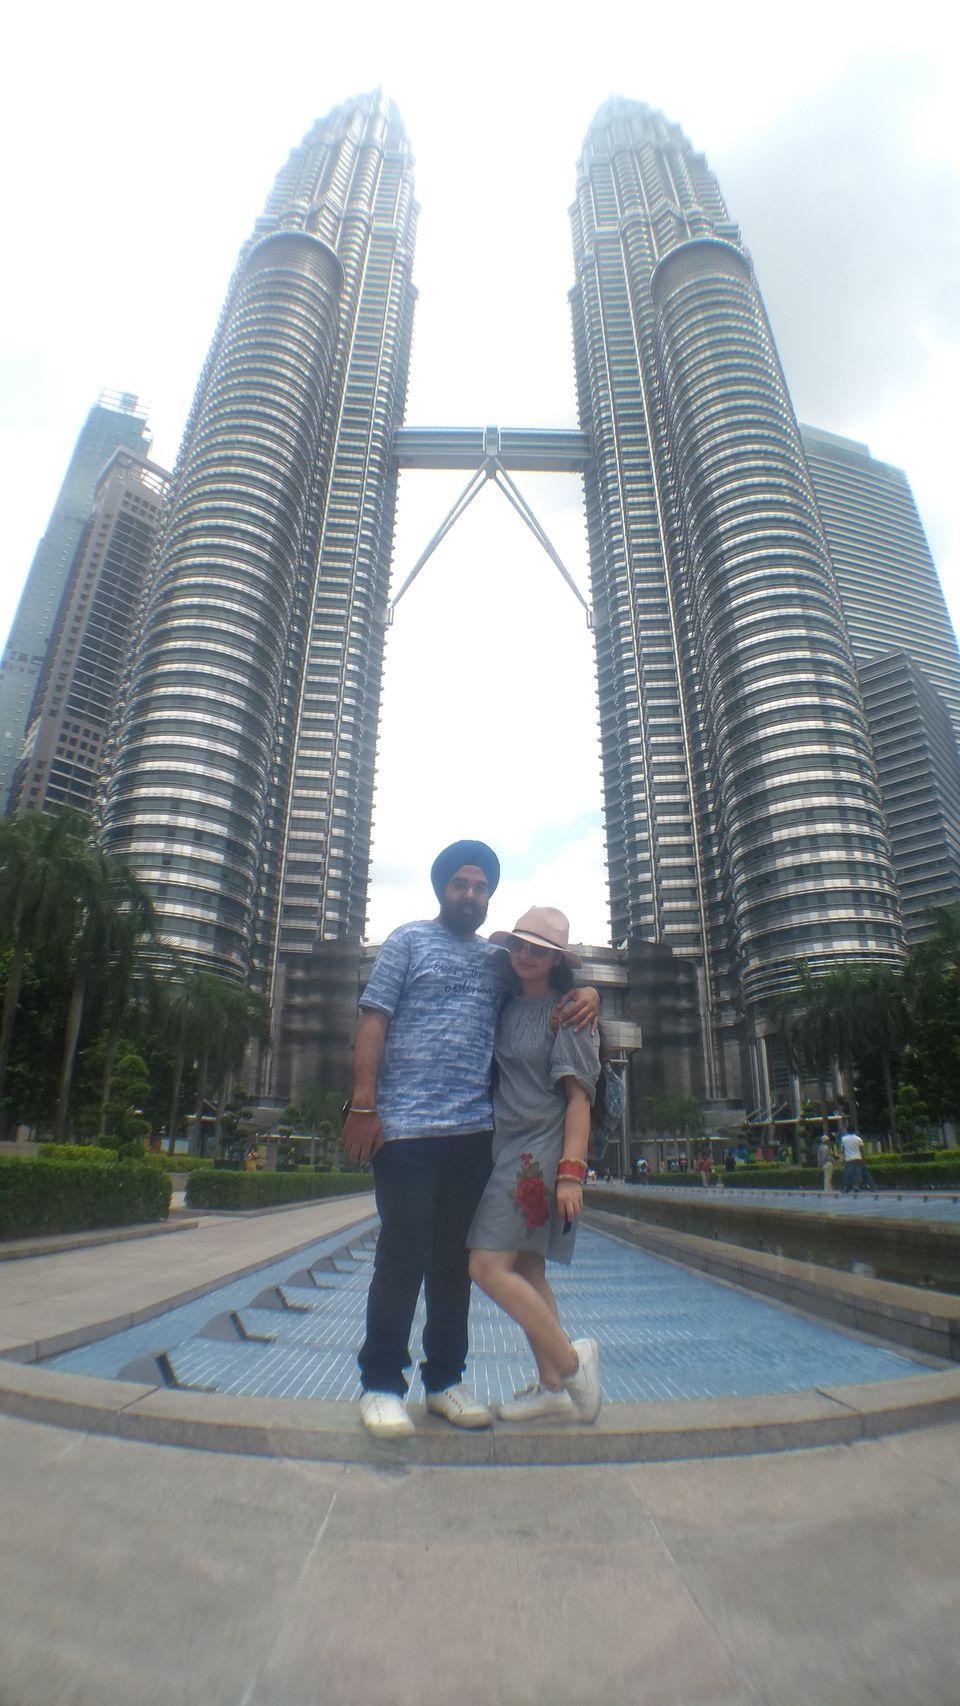 Photo of Kuala Lumpur City Centre, Kuala Lumpur, Federal Territory of Kuala Lumpur, Malaysia by Er Avneet Aziz Khurana